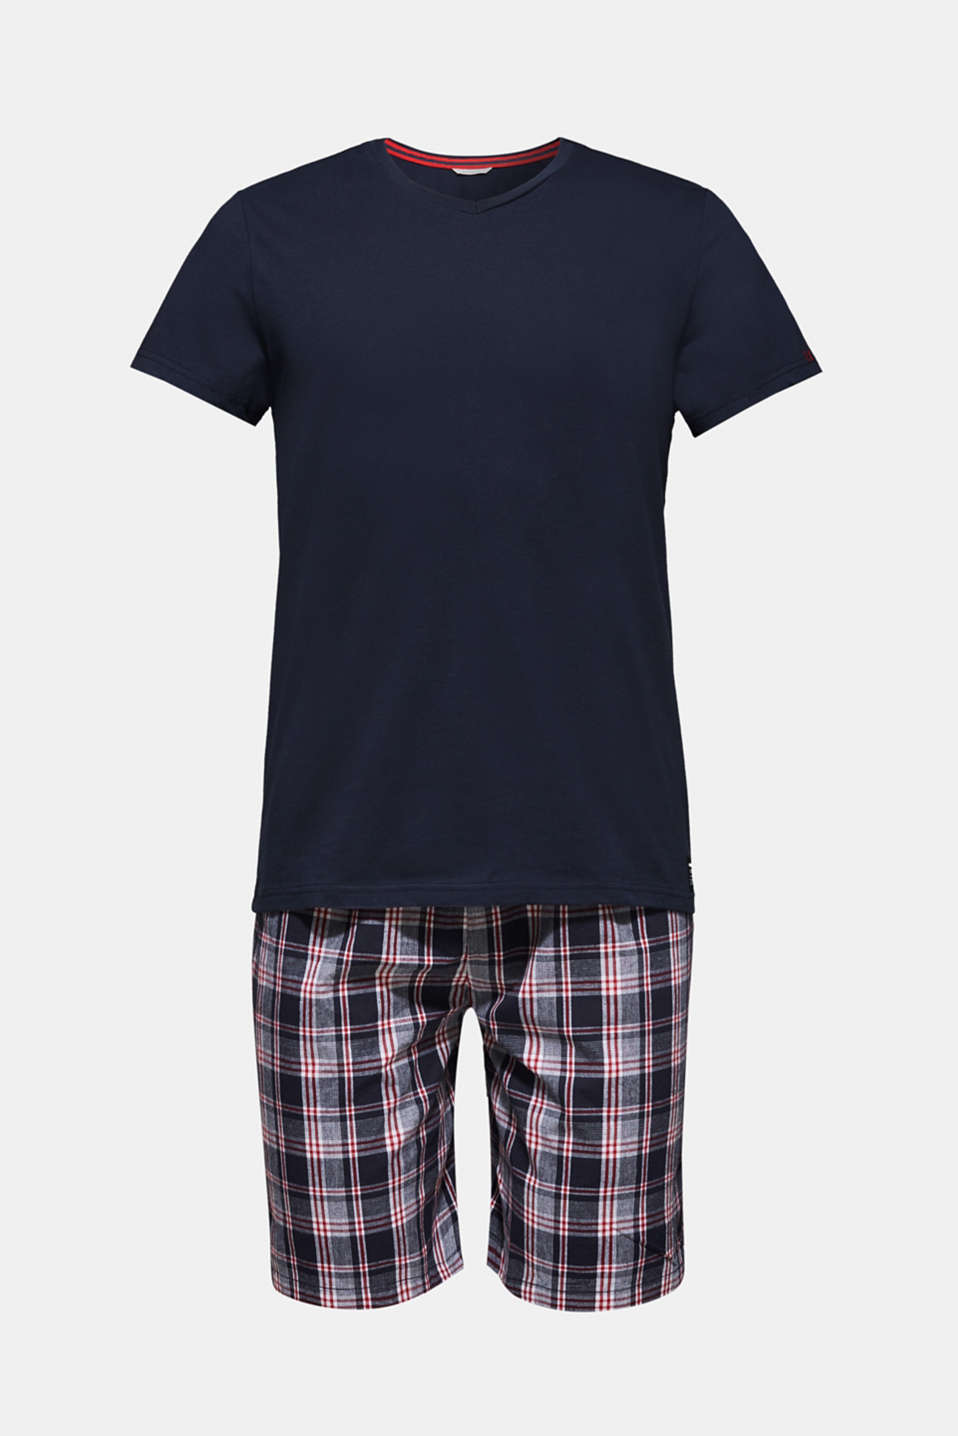 Jersey/fabric pyjamas, 100% cotton, NAVY, detail image number 3